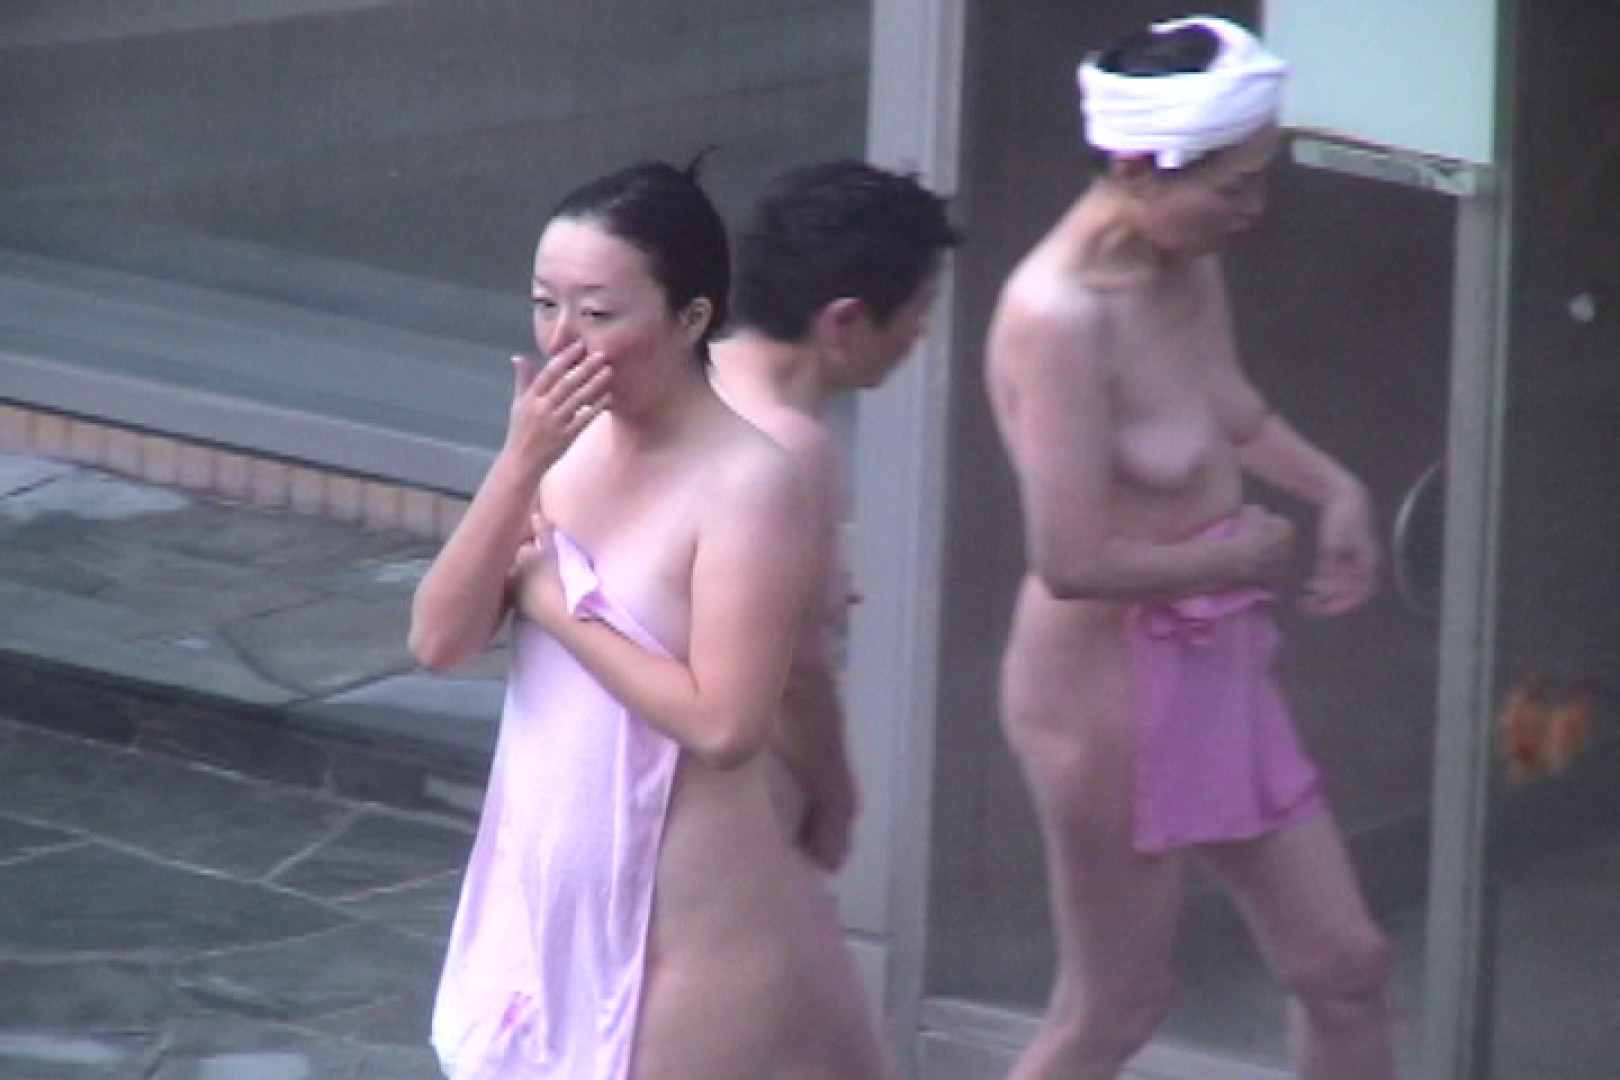 Aquaな露天風呂Vol.448 露天風呂編 | 盗撮シリーズ  90PIX 47